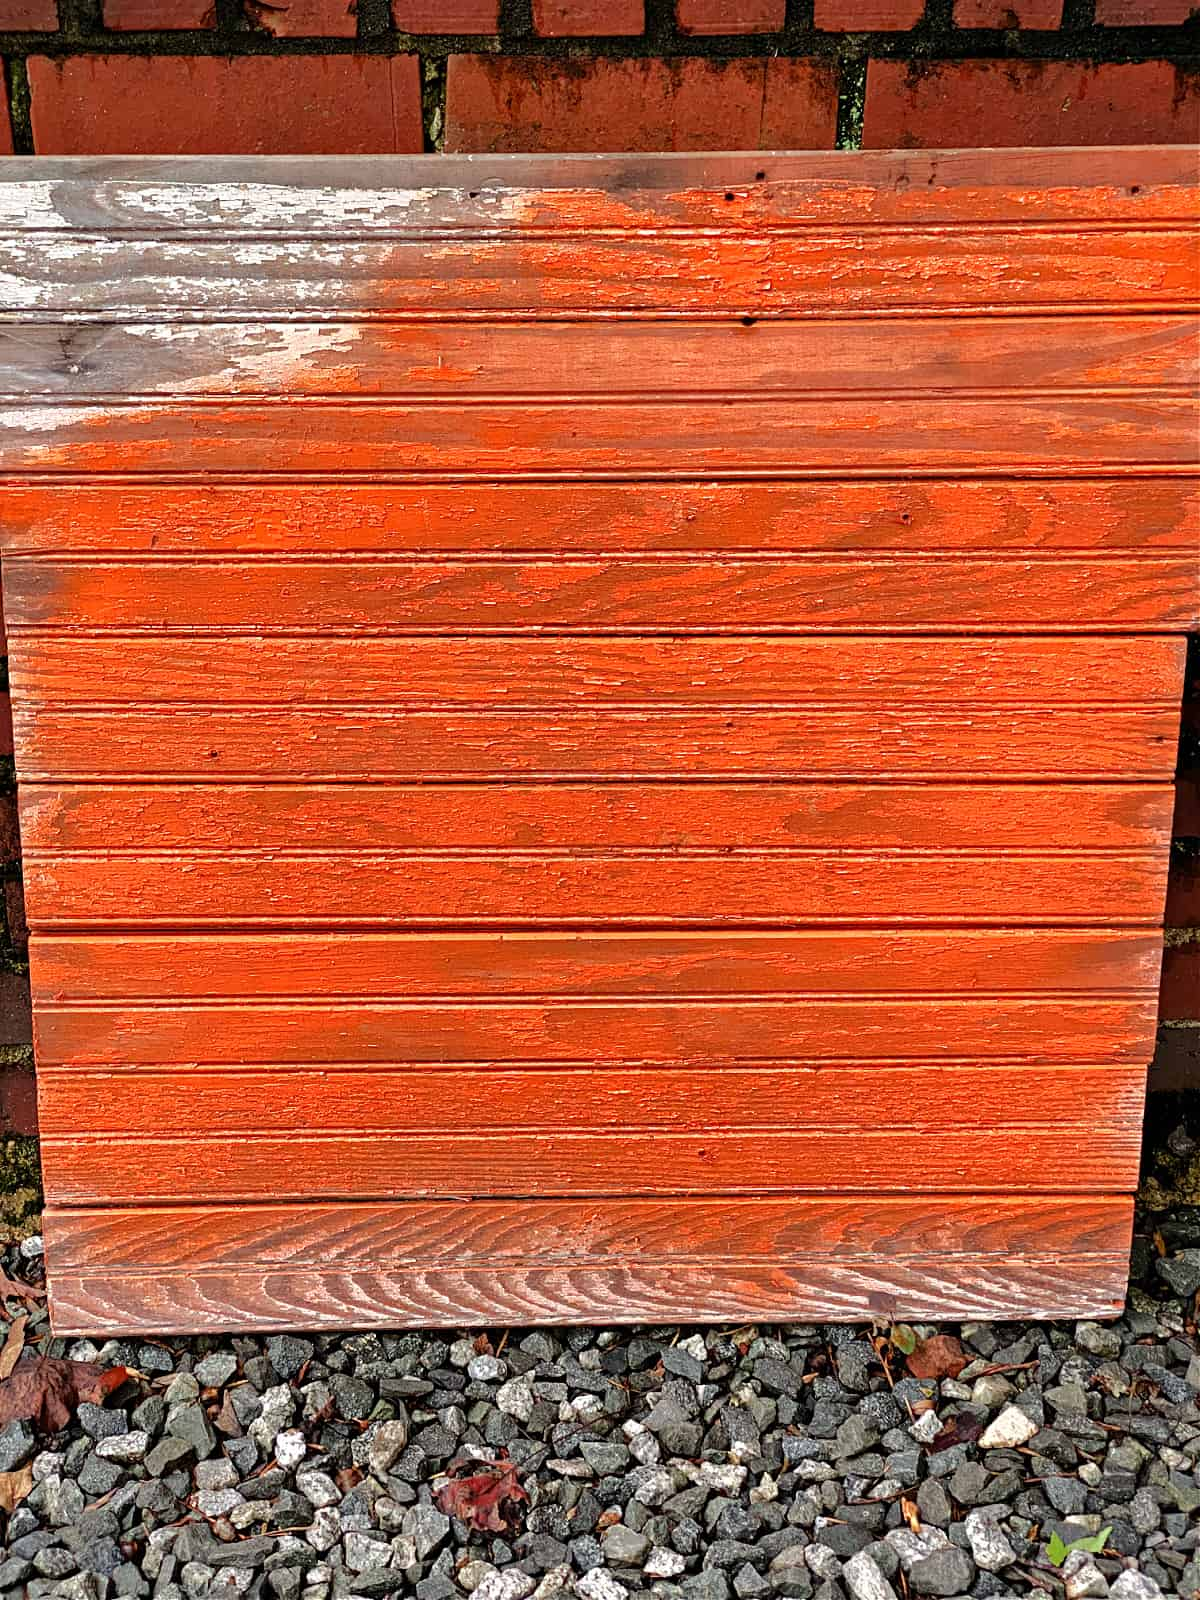 wood sign painted orange